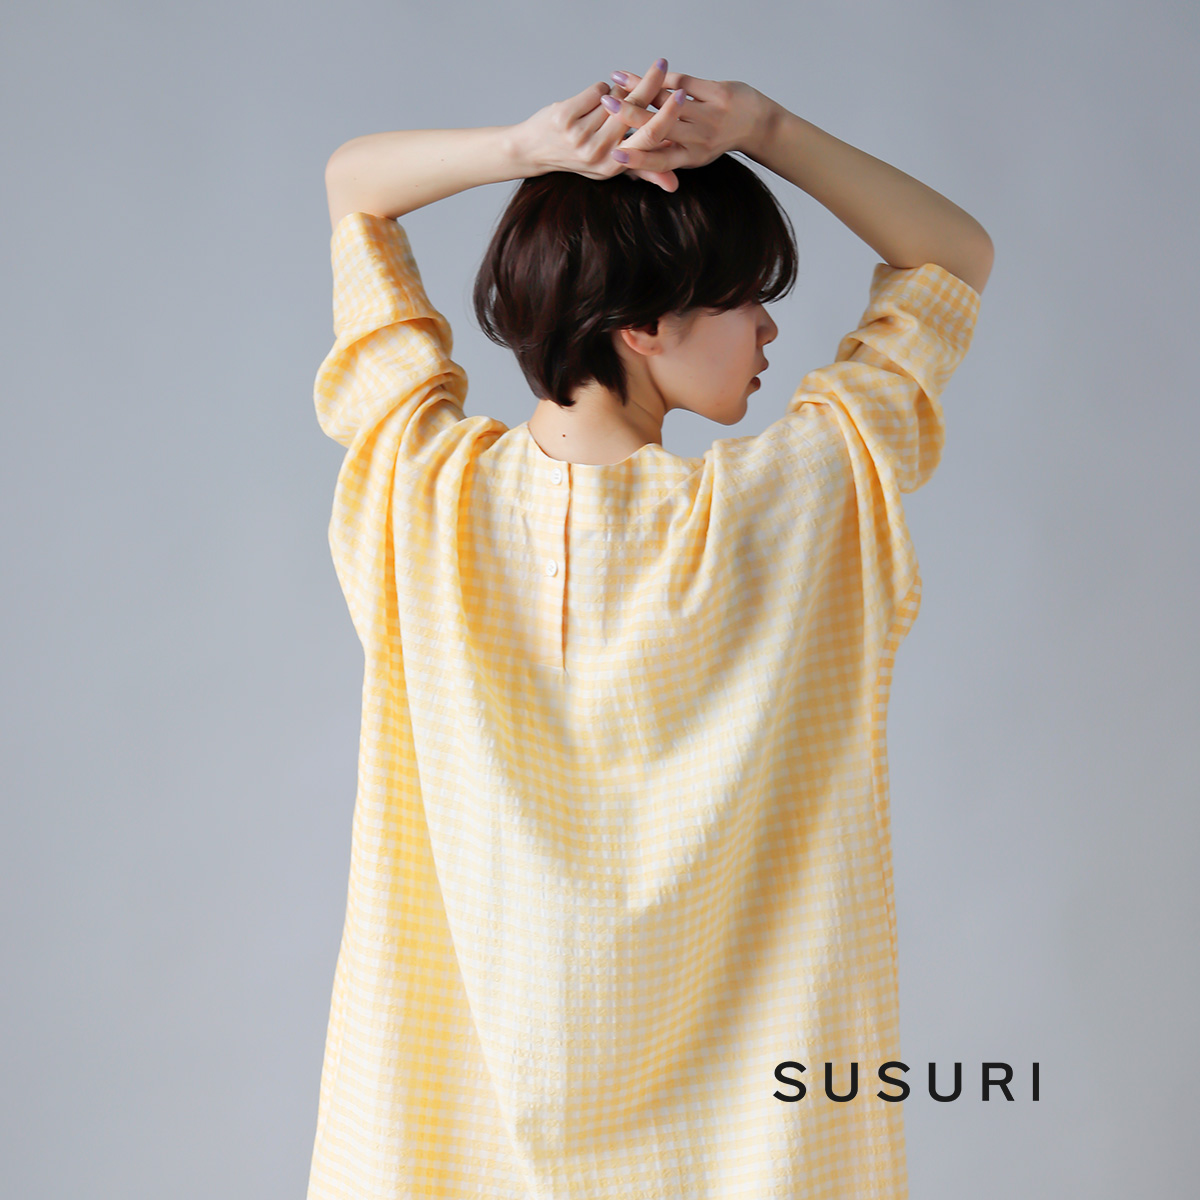 susuri(ススリ)フィンレットドレス 21-202